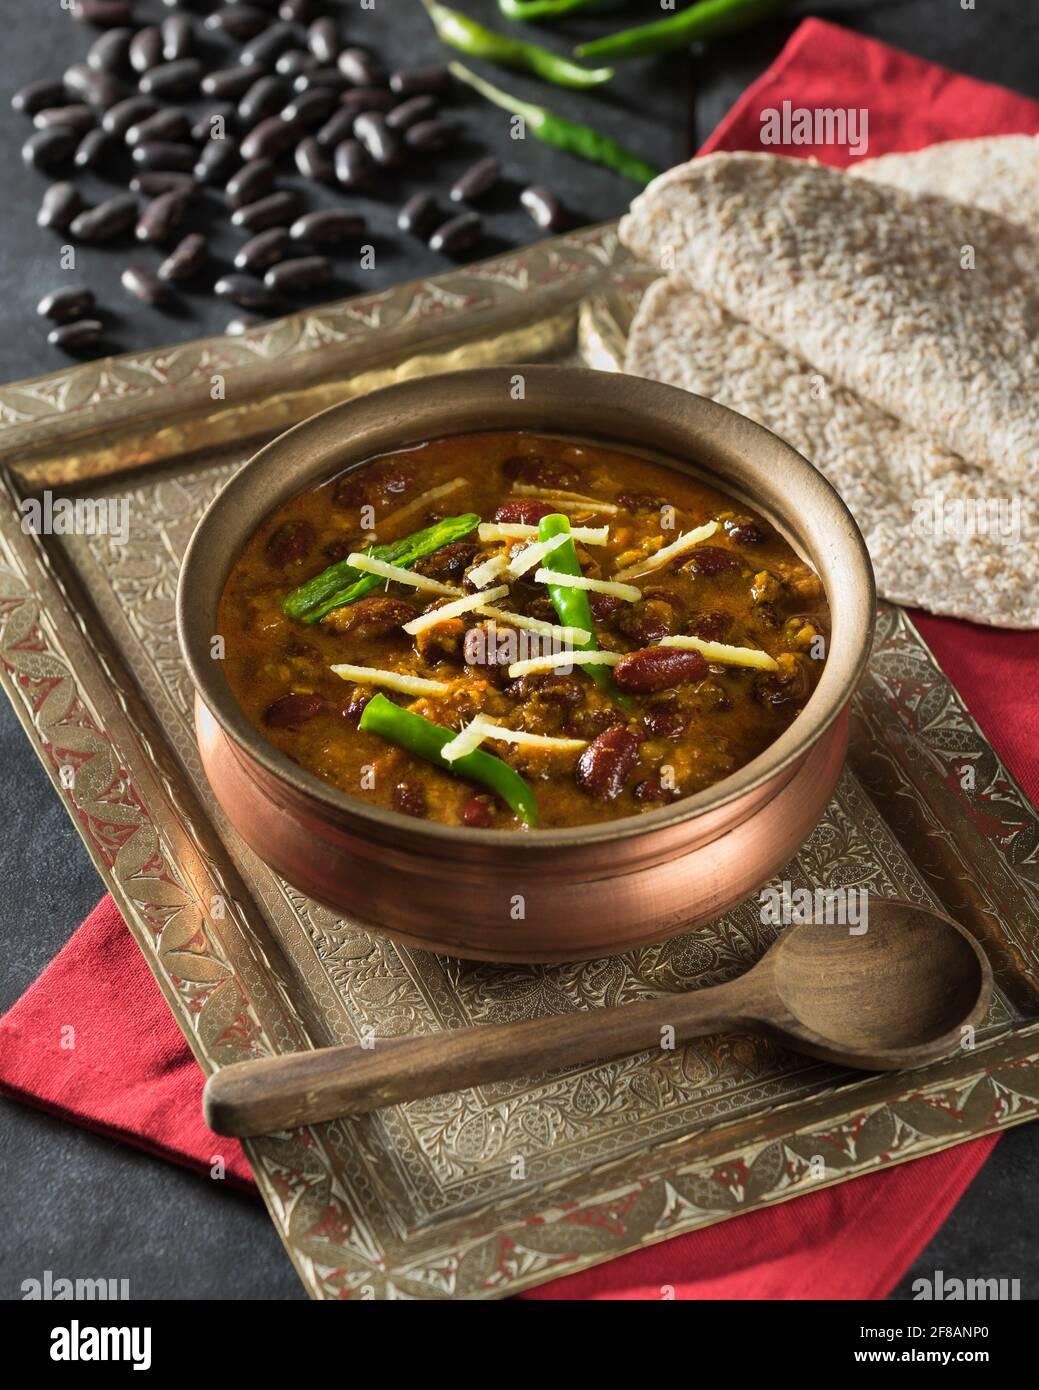 Rajma masala. Red kidney bean curry. India Food Stock Photo